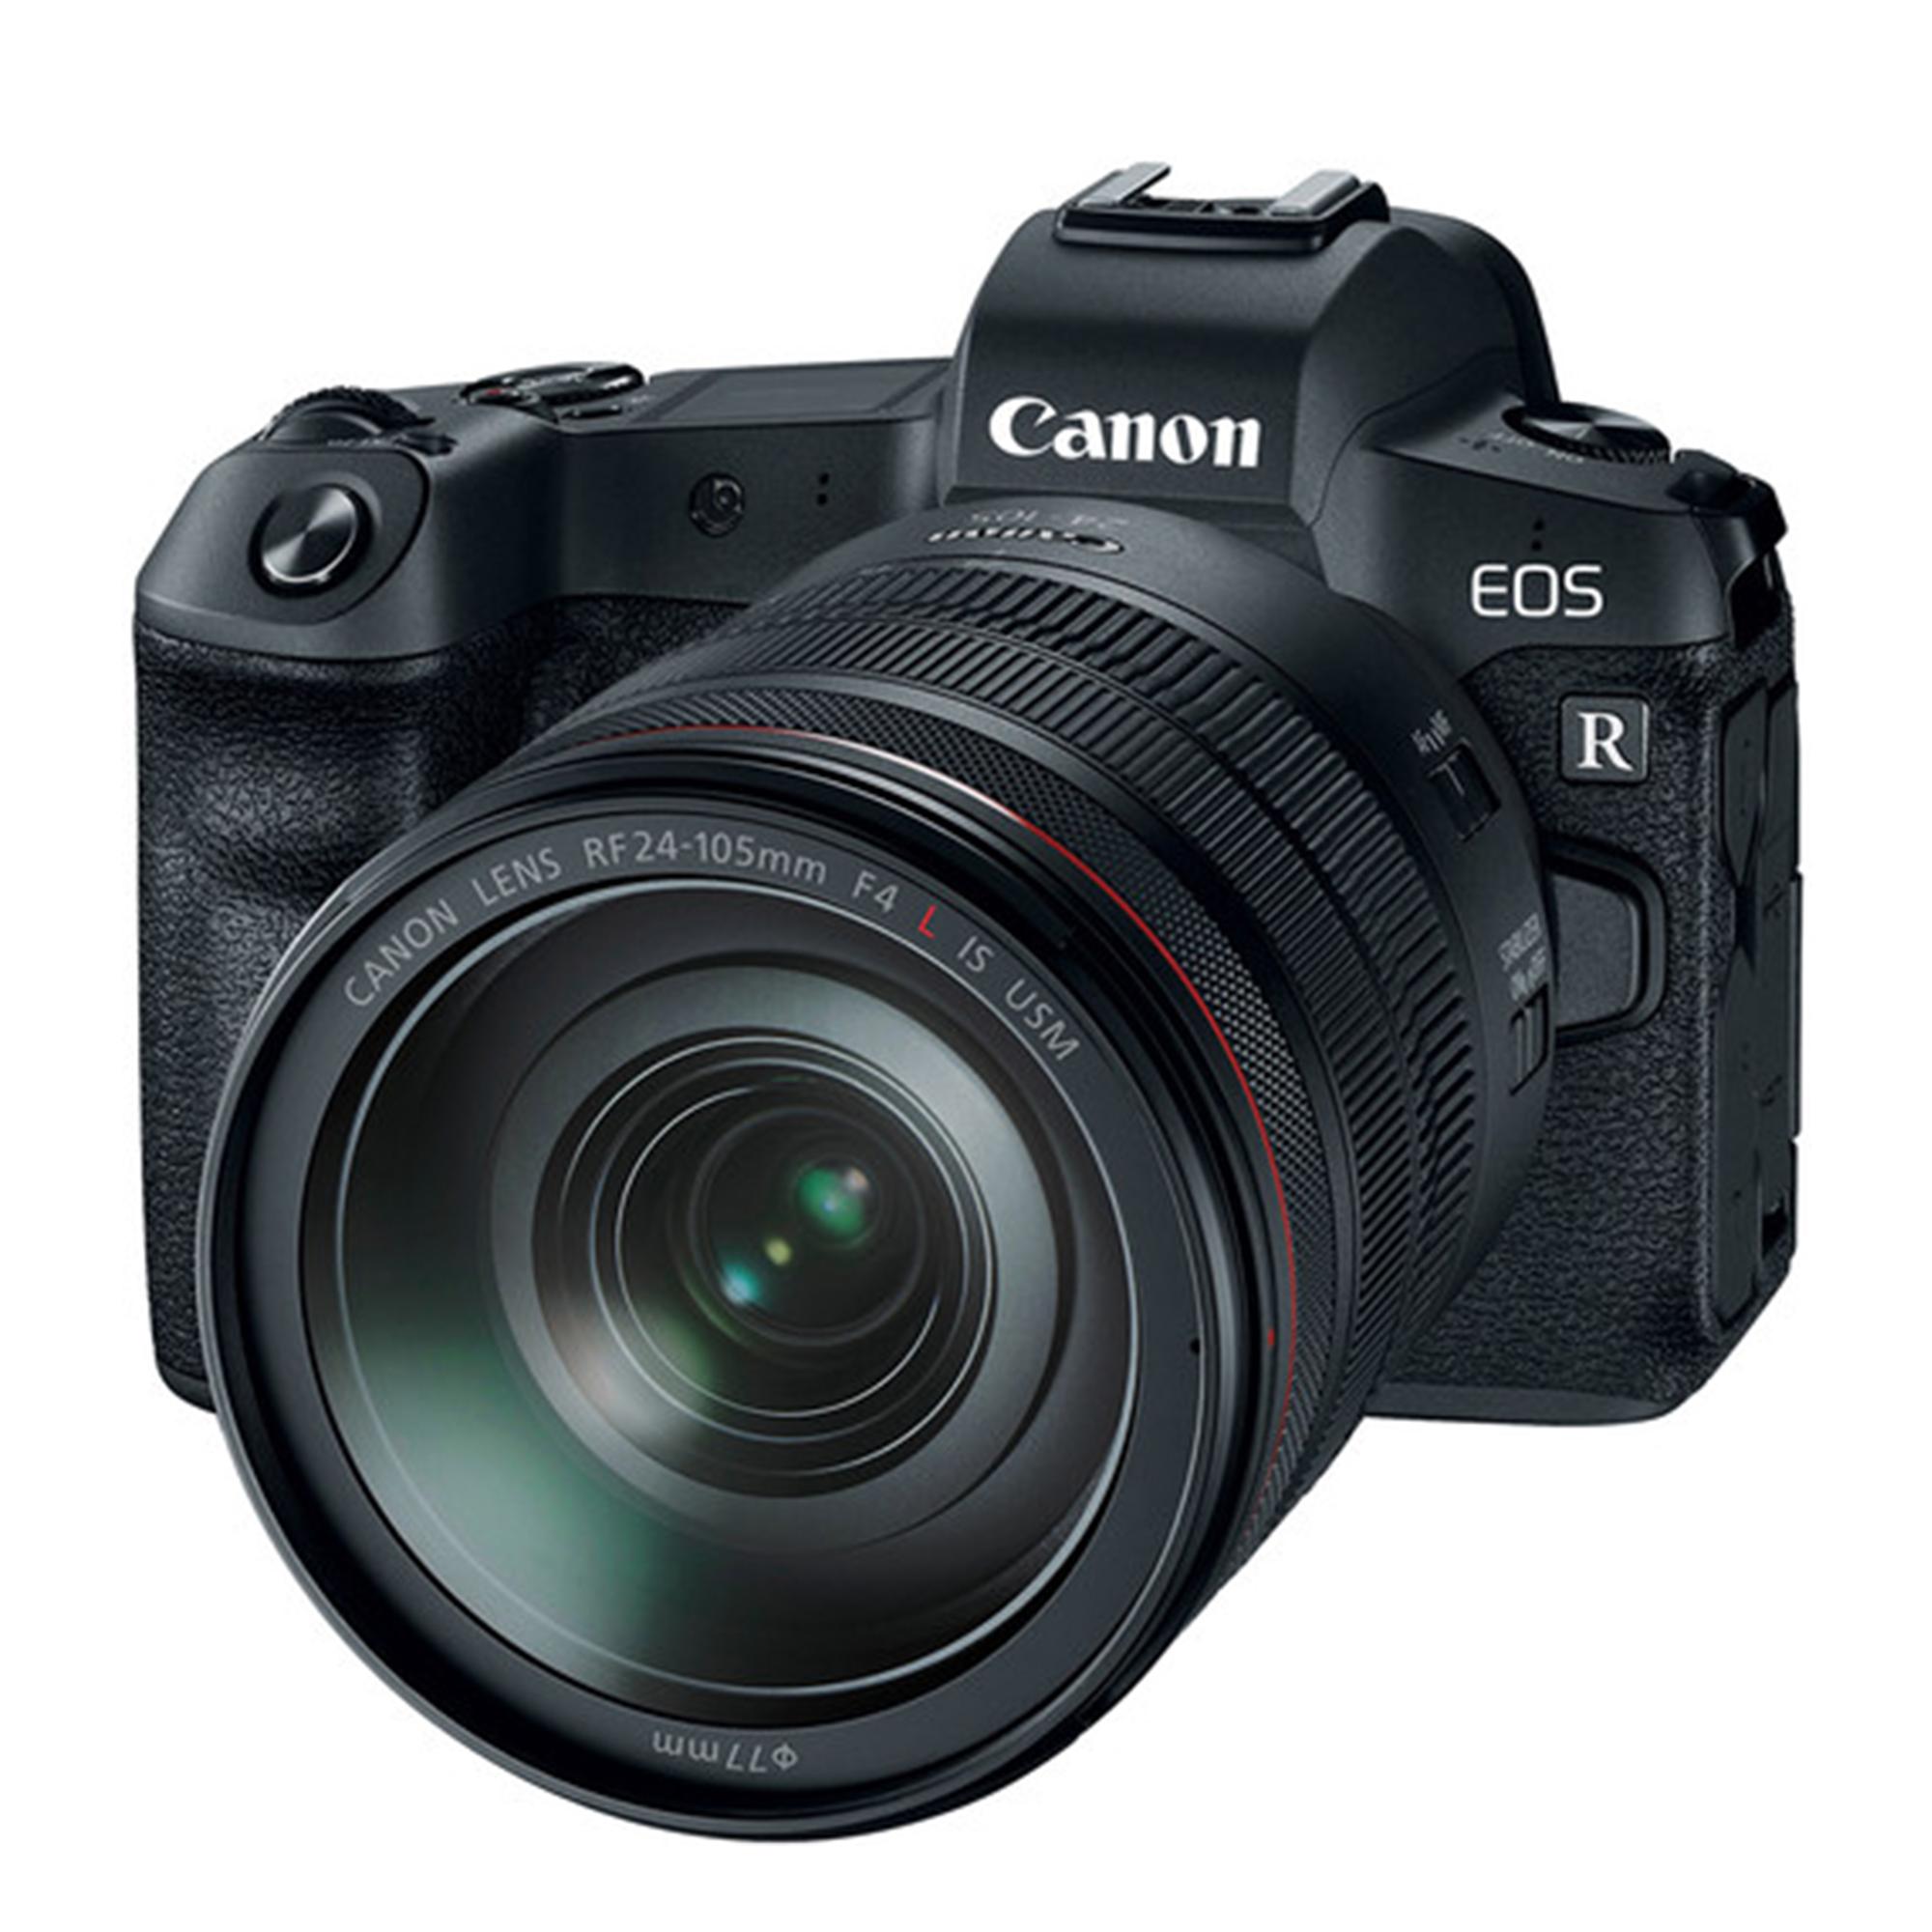 canon EOS R Mirrorless Digital Camera + RF 24-105mm F4 IS USM Lens